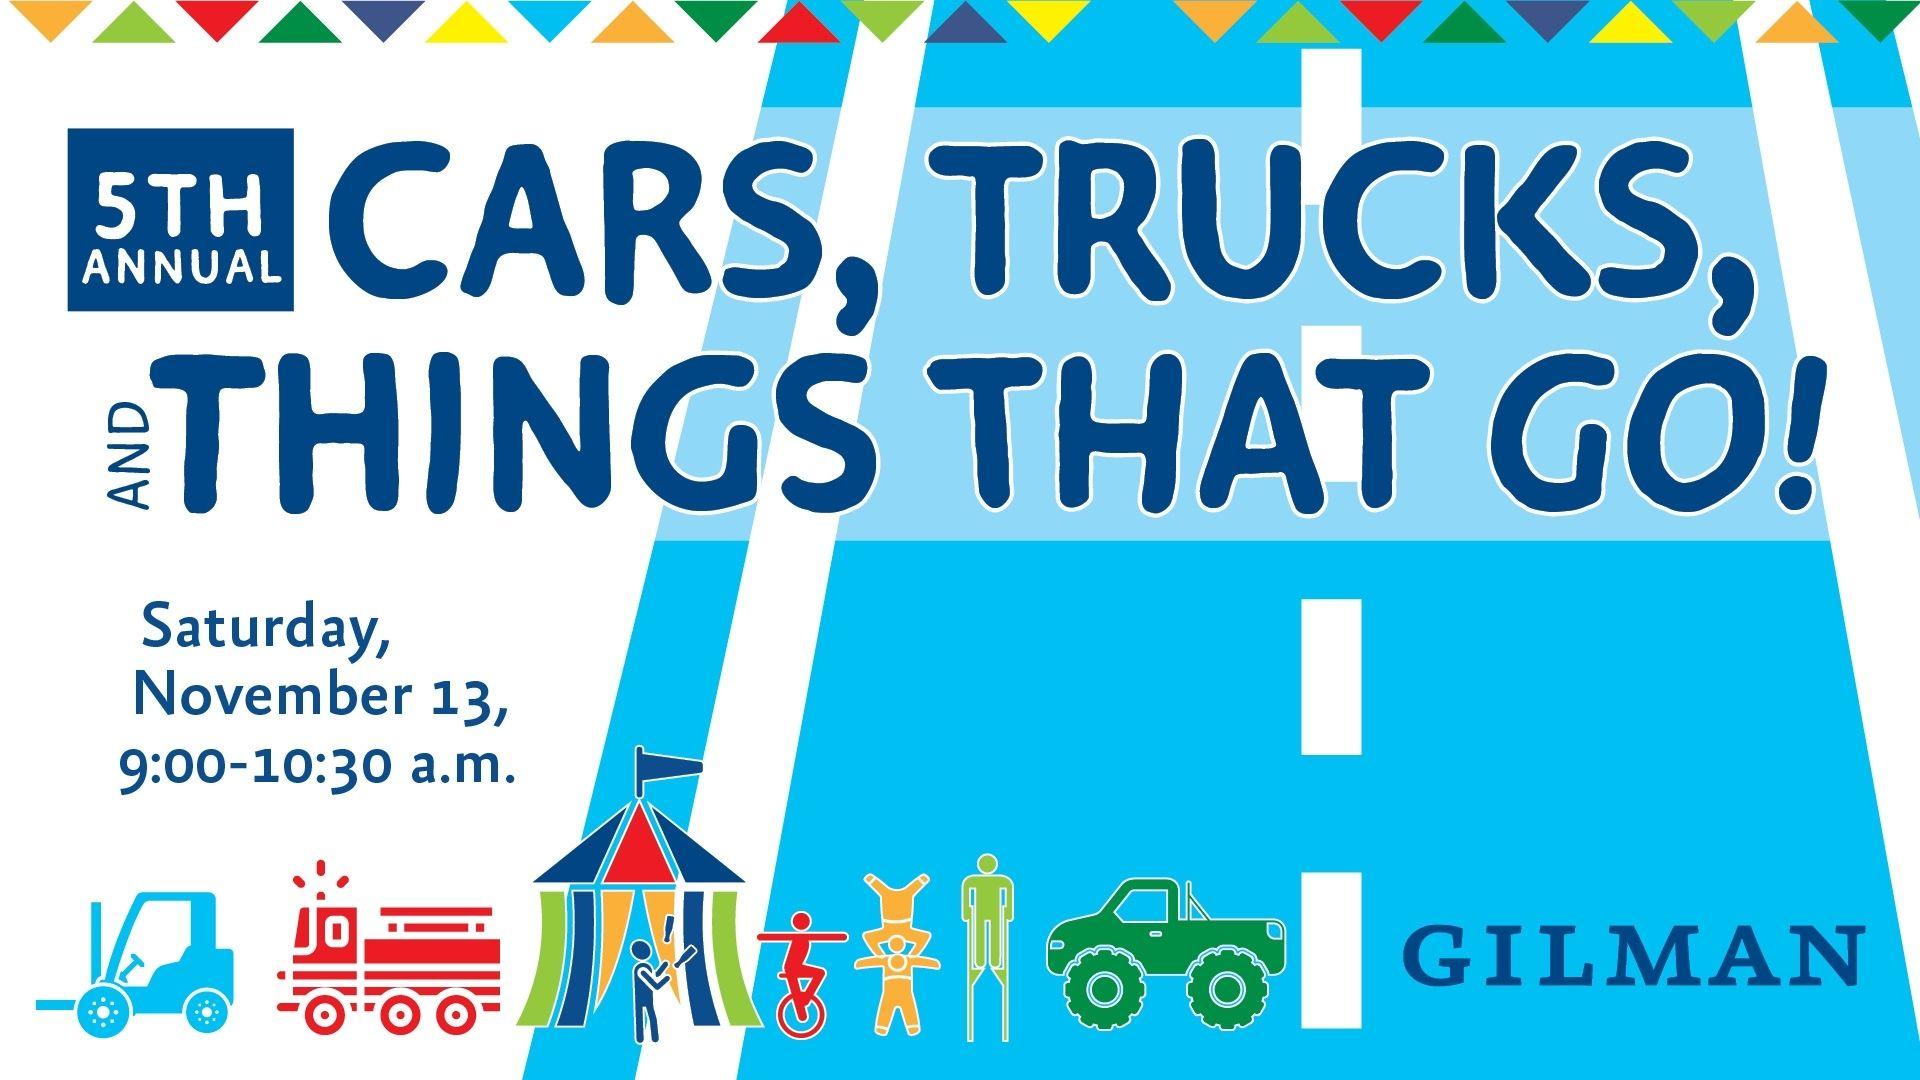 Cars, Trucks, Things that Go